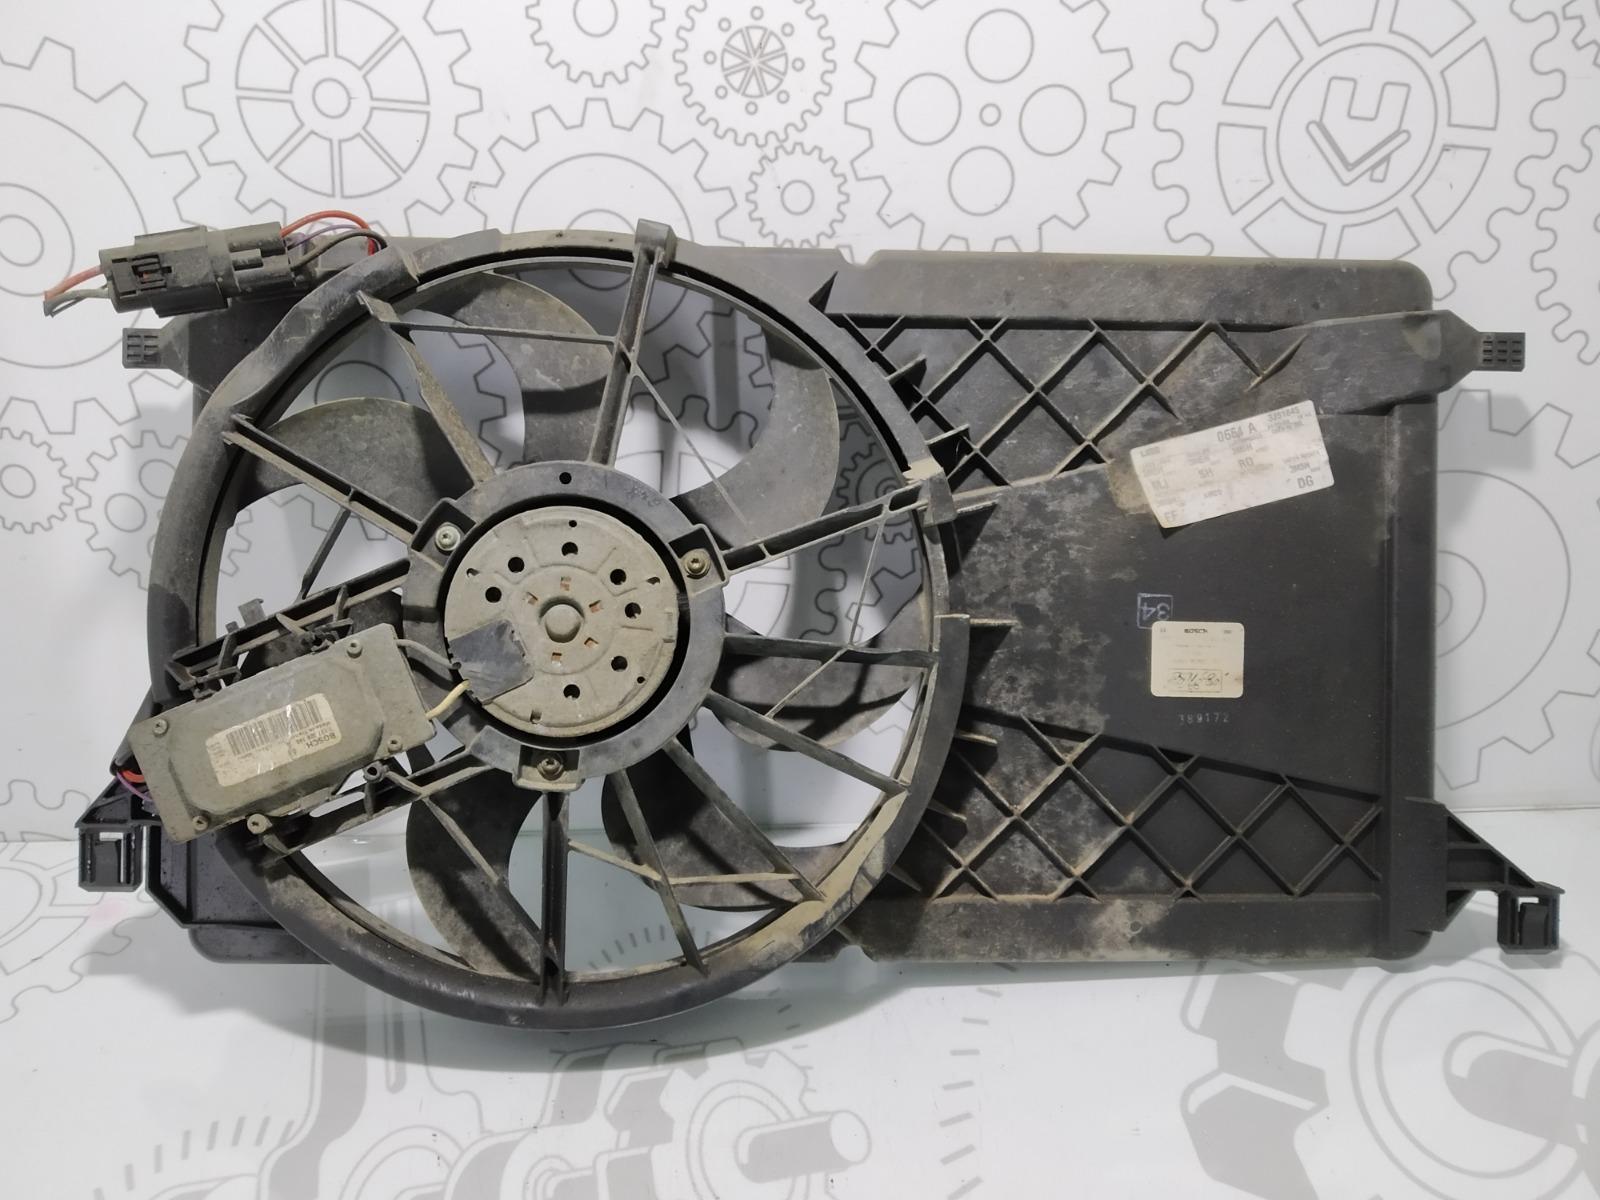 Вентилятор радиатора Ford C-Max 1.8 I 2003 (б/у)